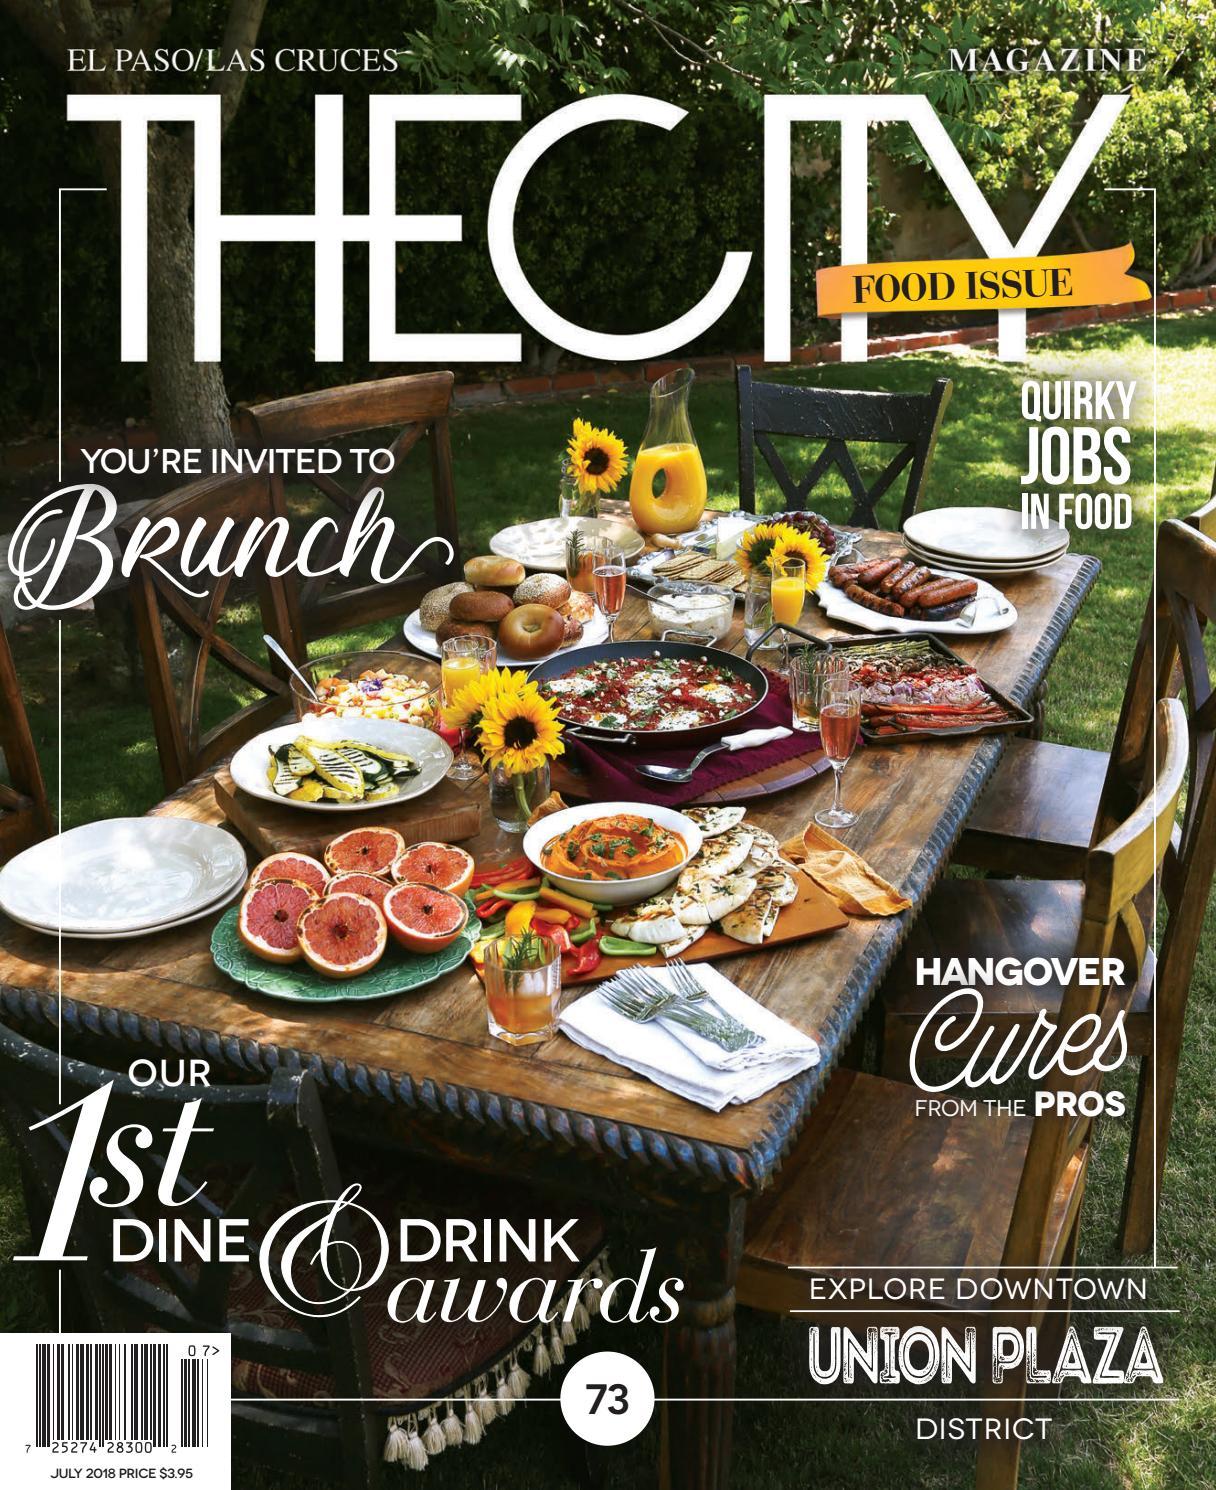 THECITY Magazine El Paso • July 2018 By THECITY Magazine